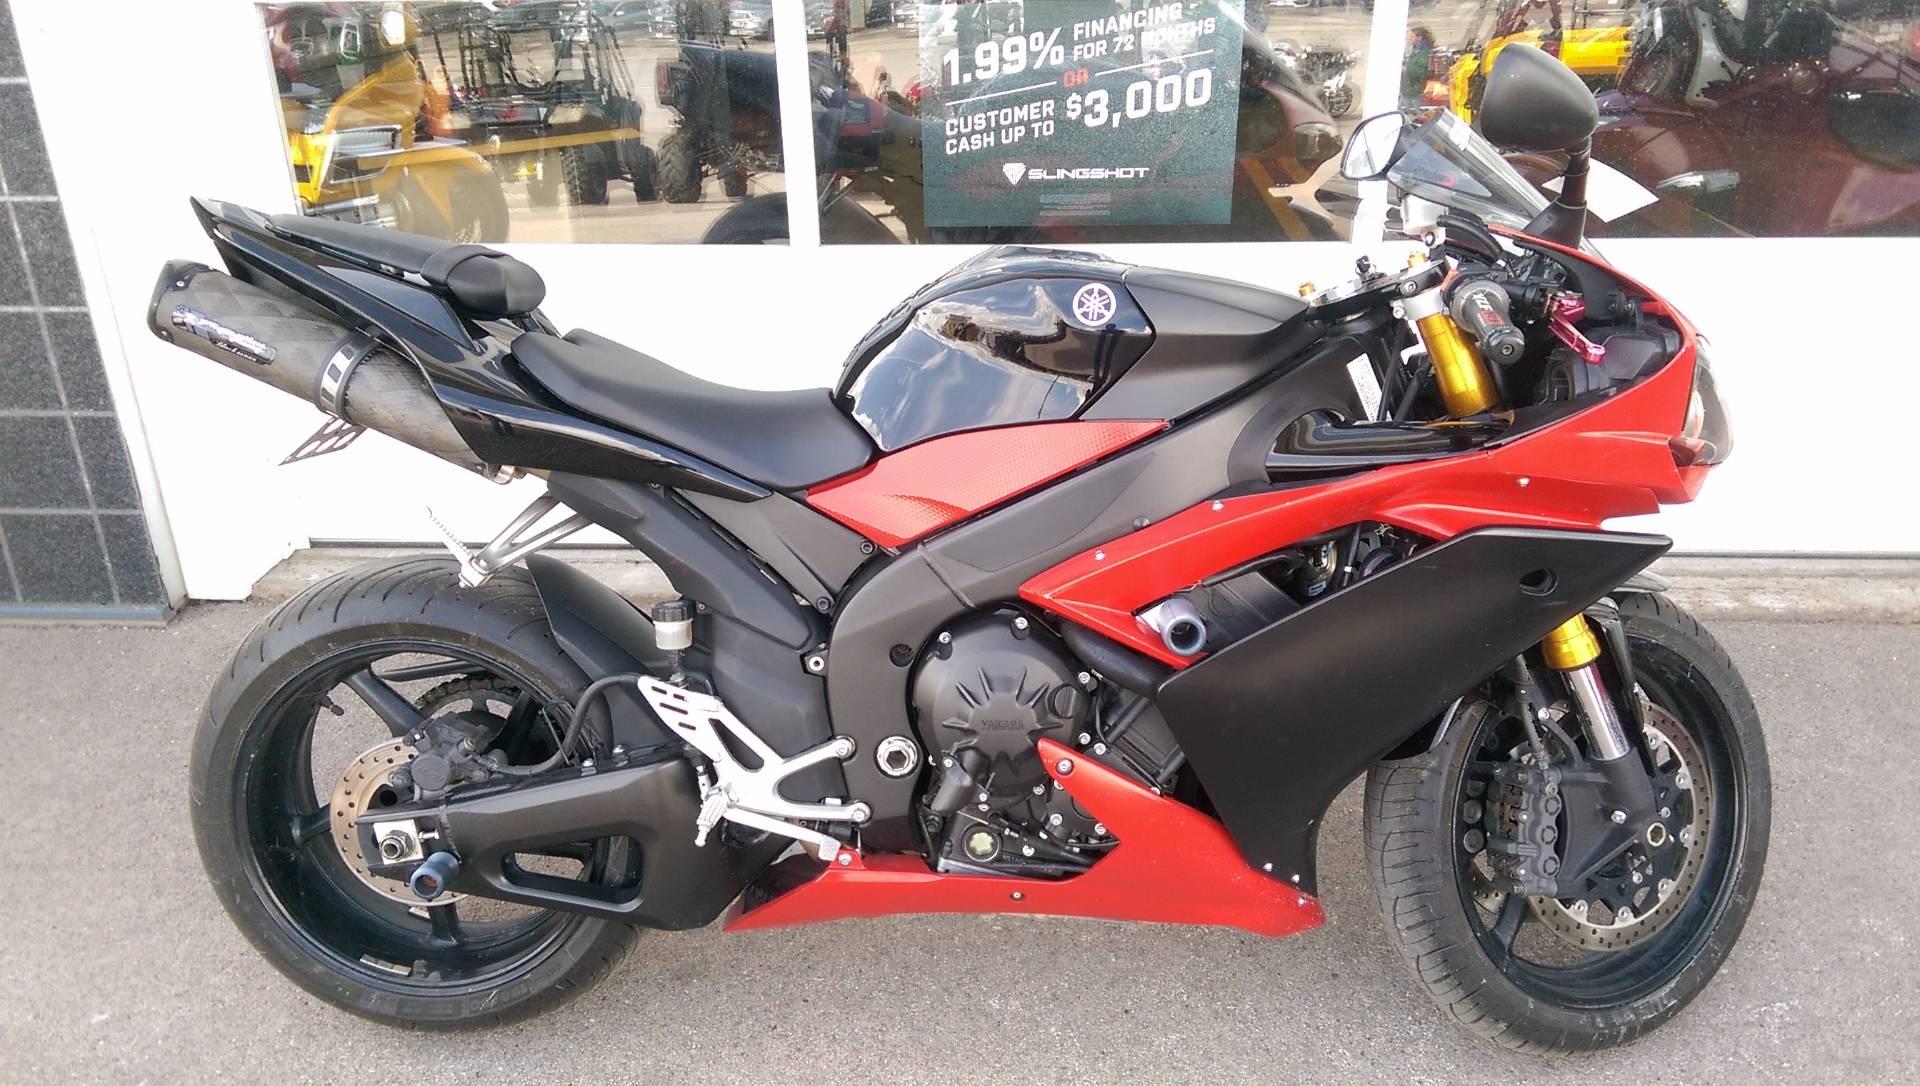 2008 yamaha yzfr1 for sale for Yamaha rapid city sd